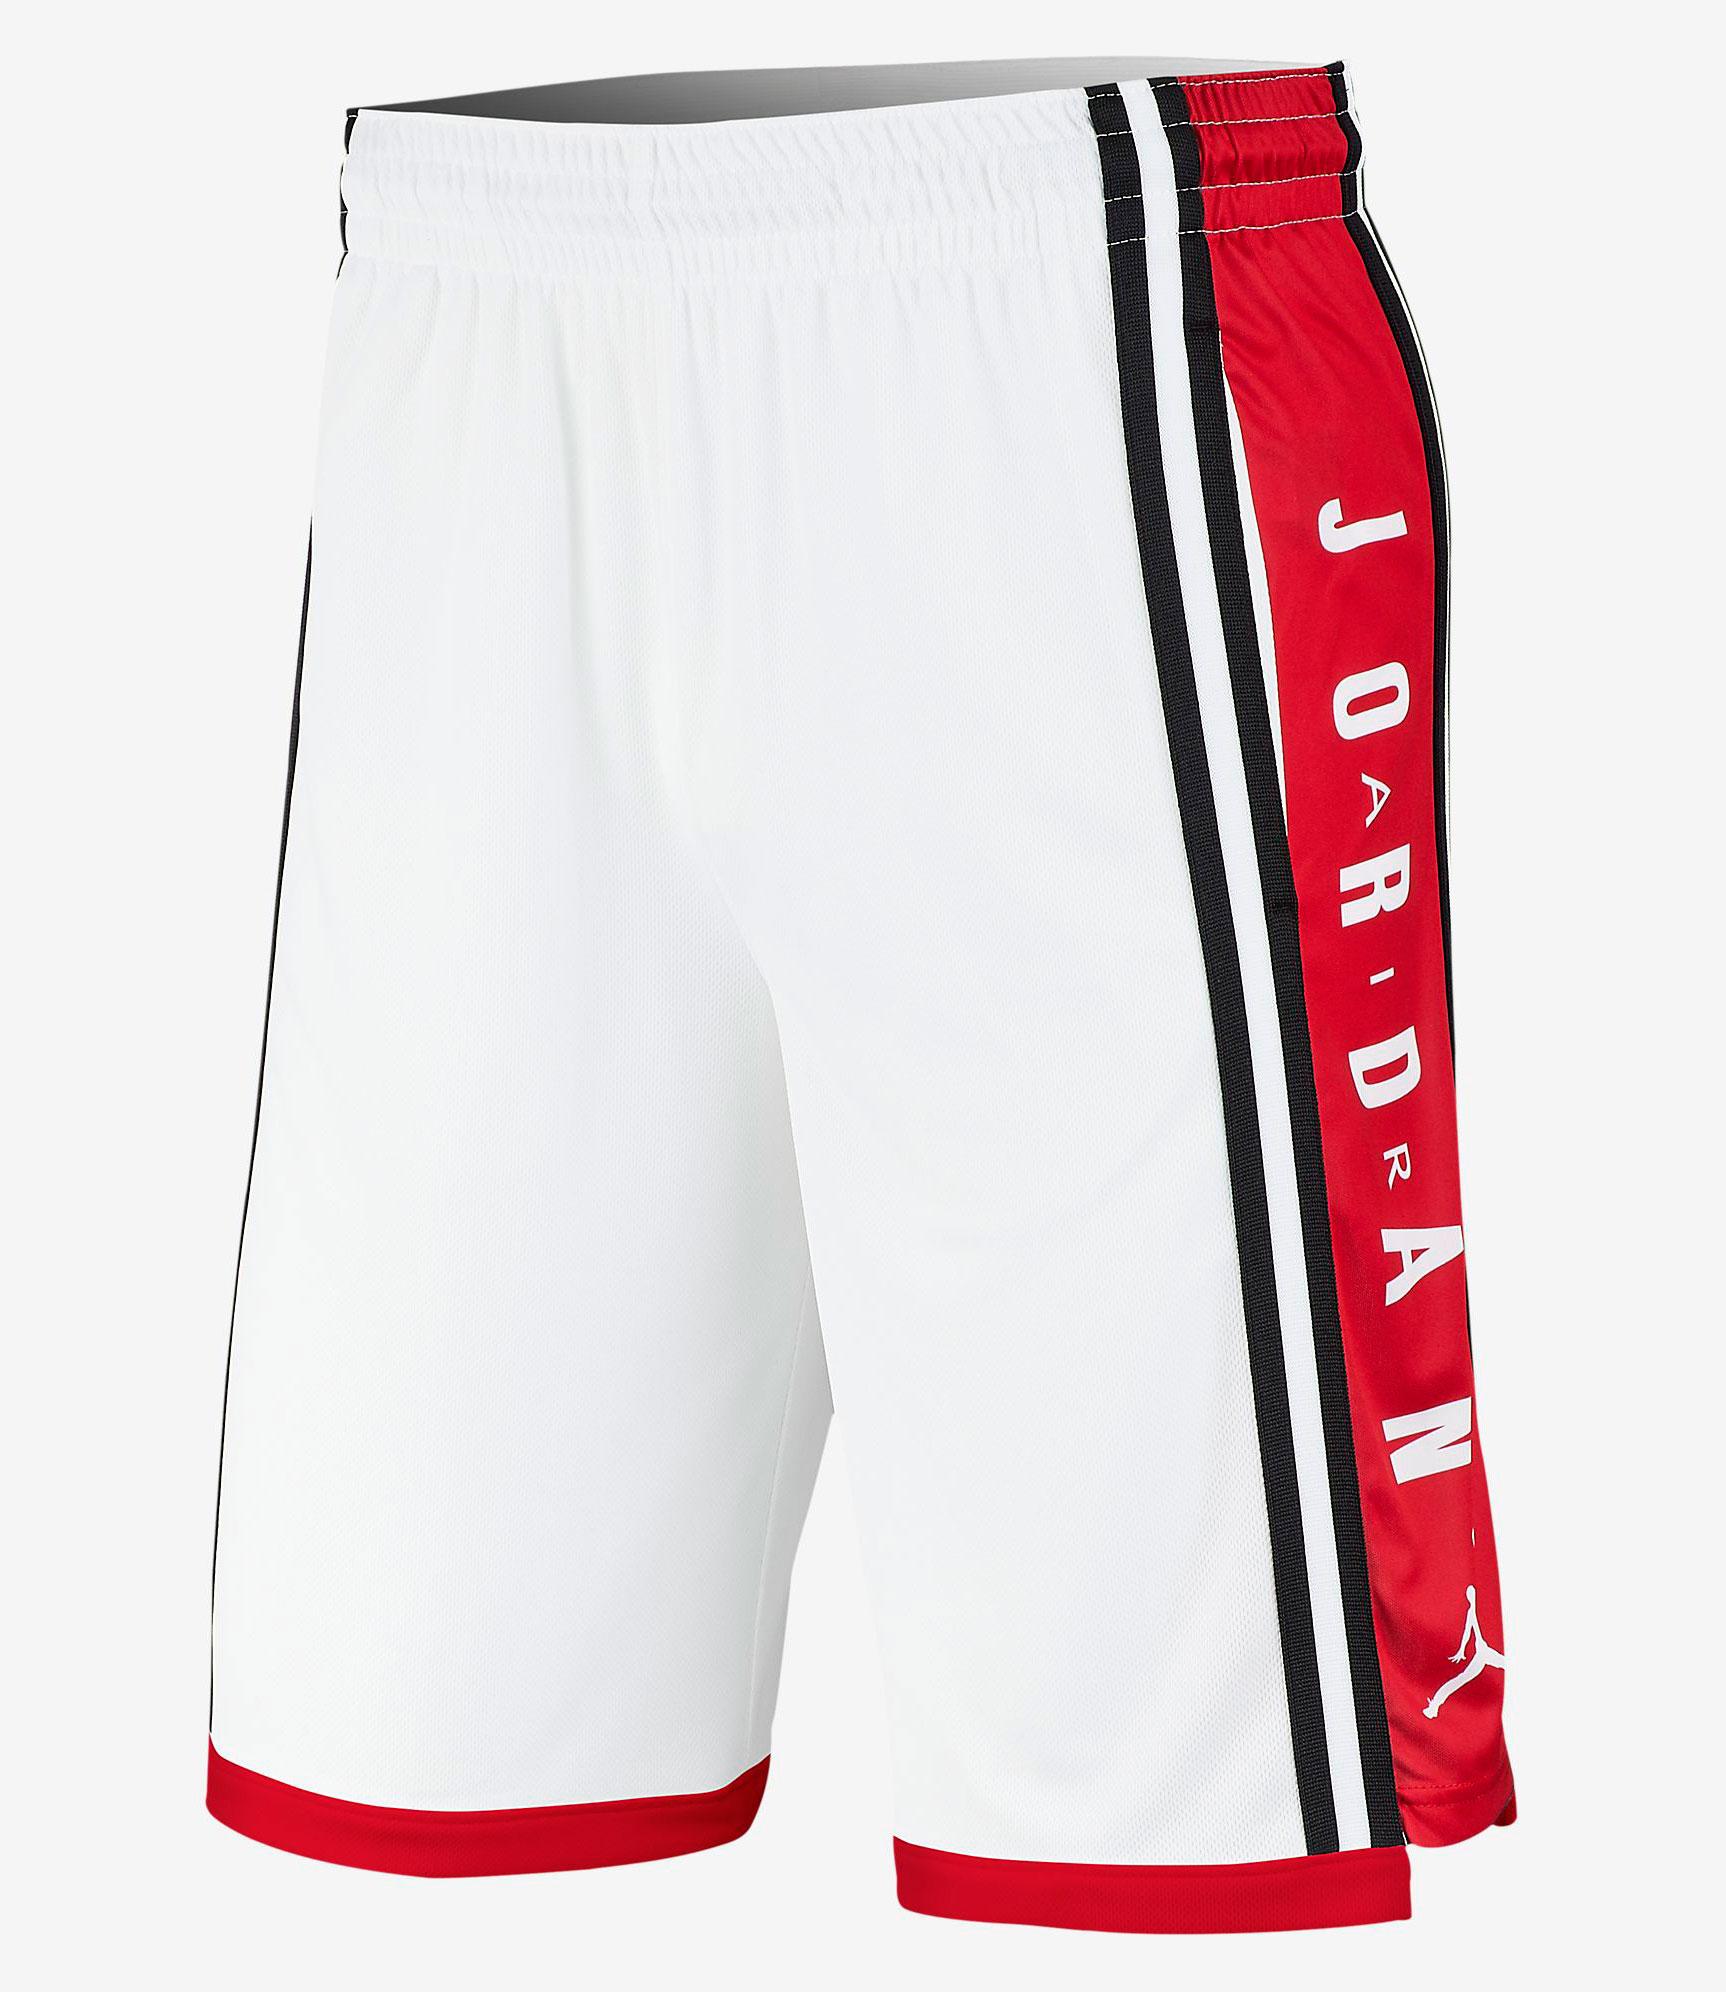 air-jordan-3-tinker-air-max-1-shorts-match-2